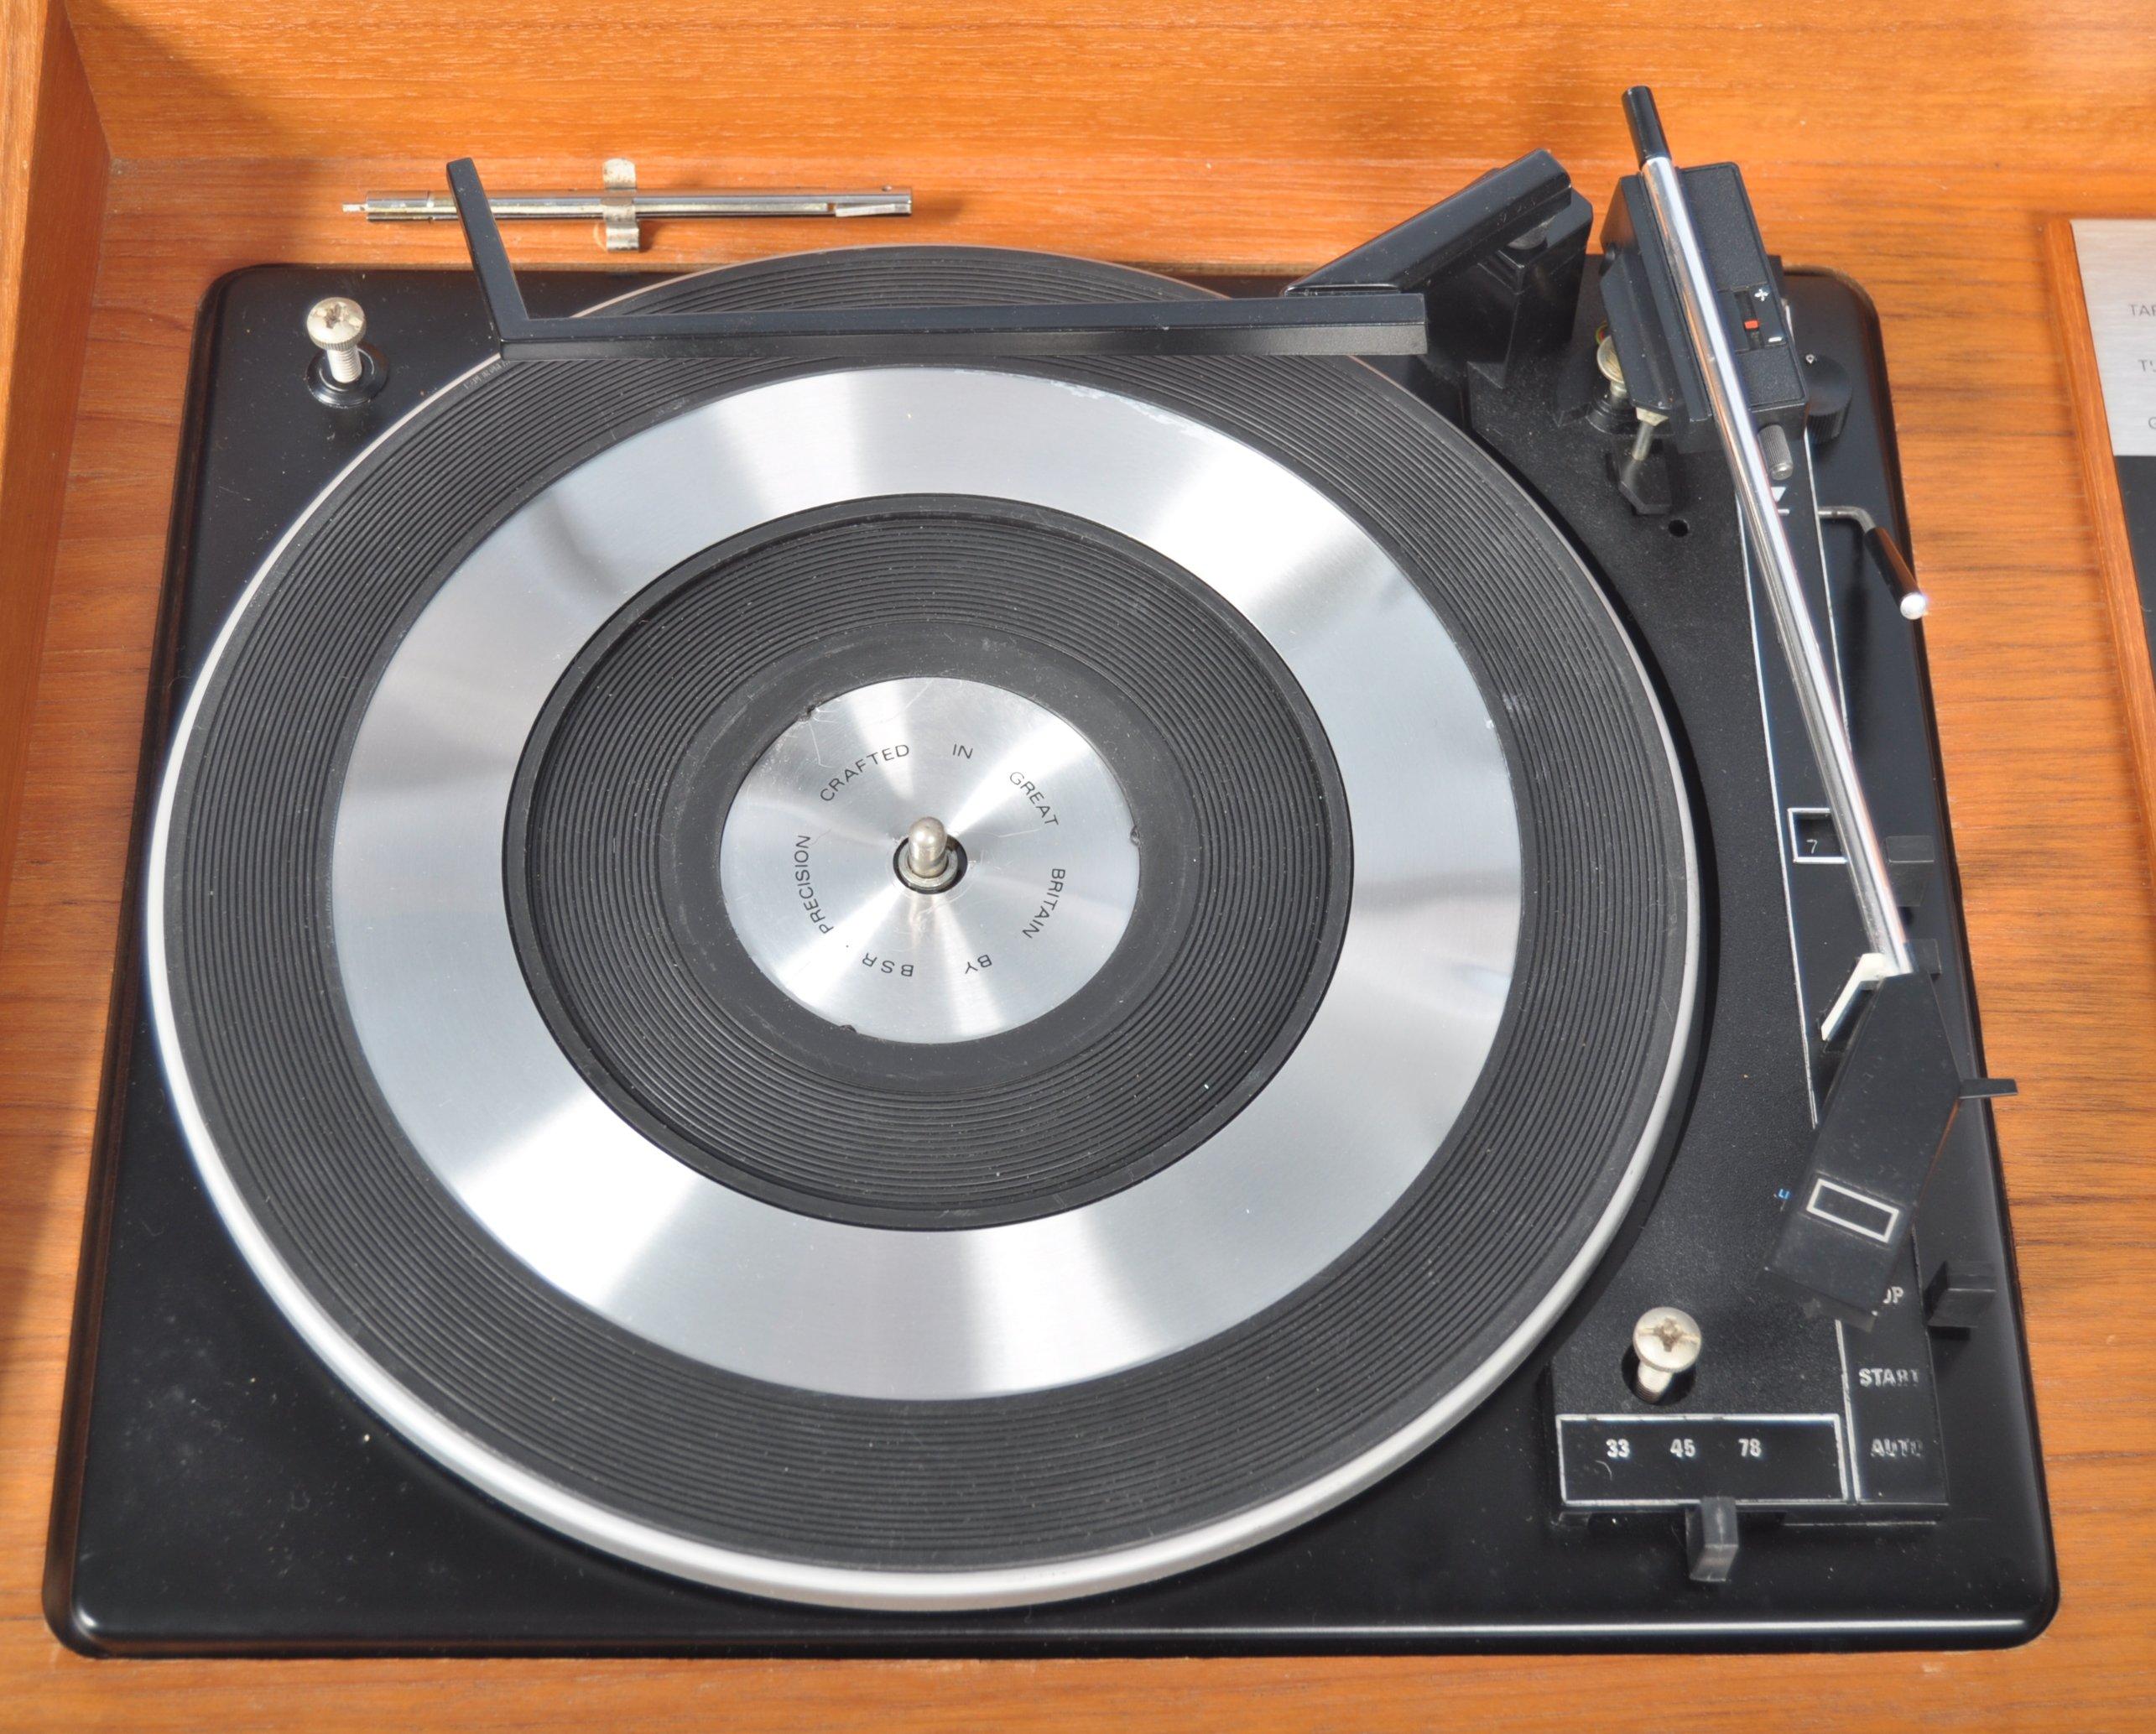 STUNNING DECCA SOUND TEAK CASED AUDIO SYSTEM RAISED ON CHROME SUPPORTS - Image 4 of 8